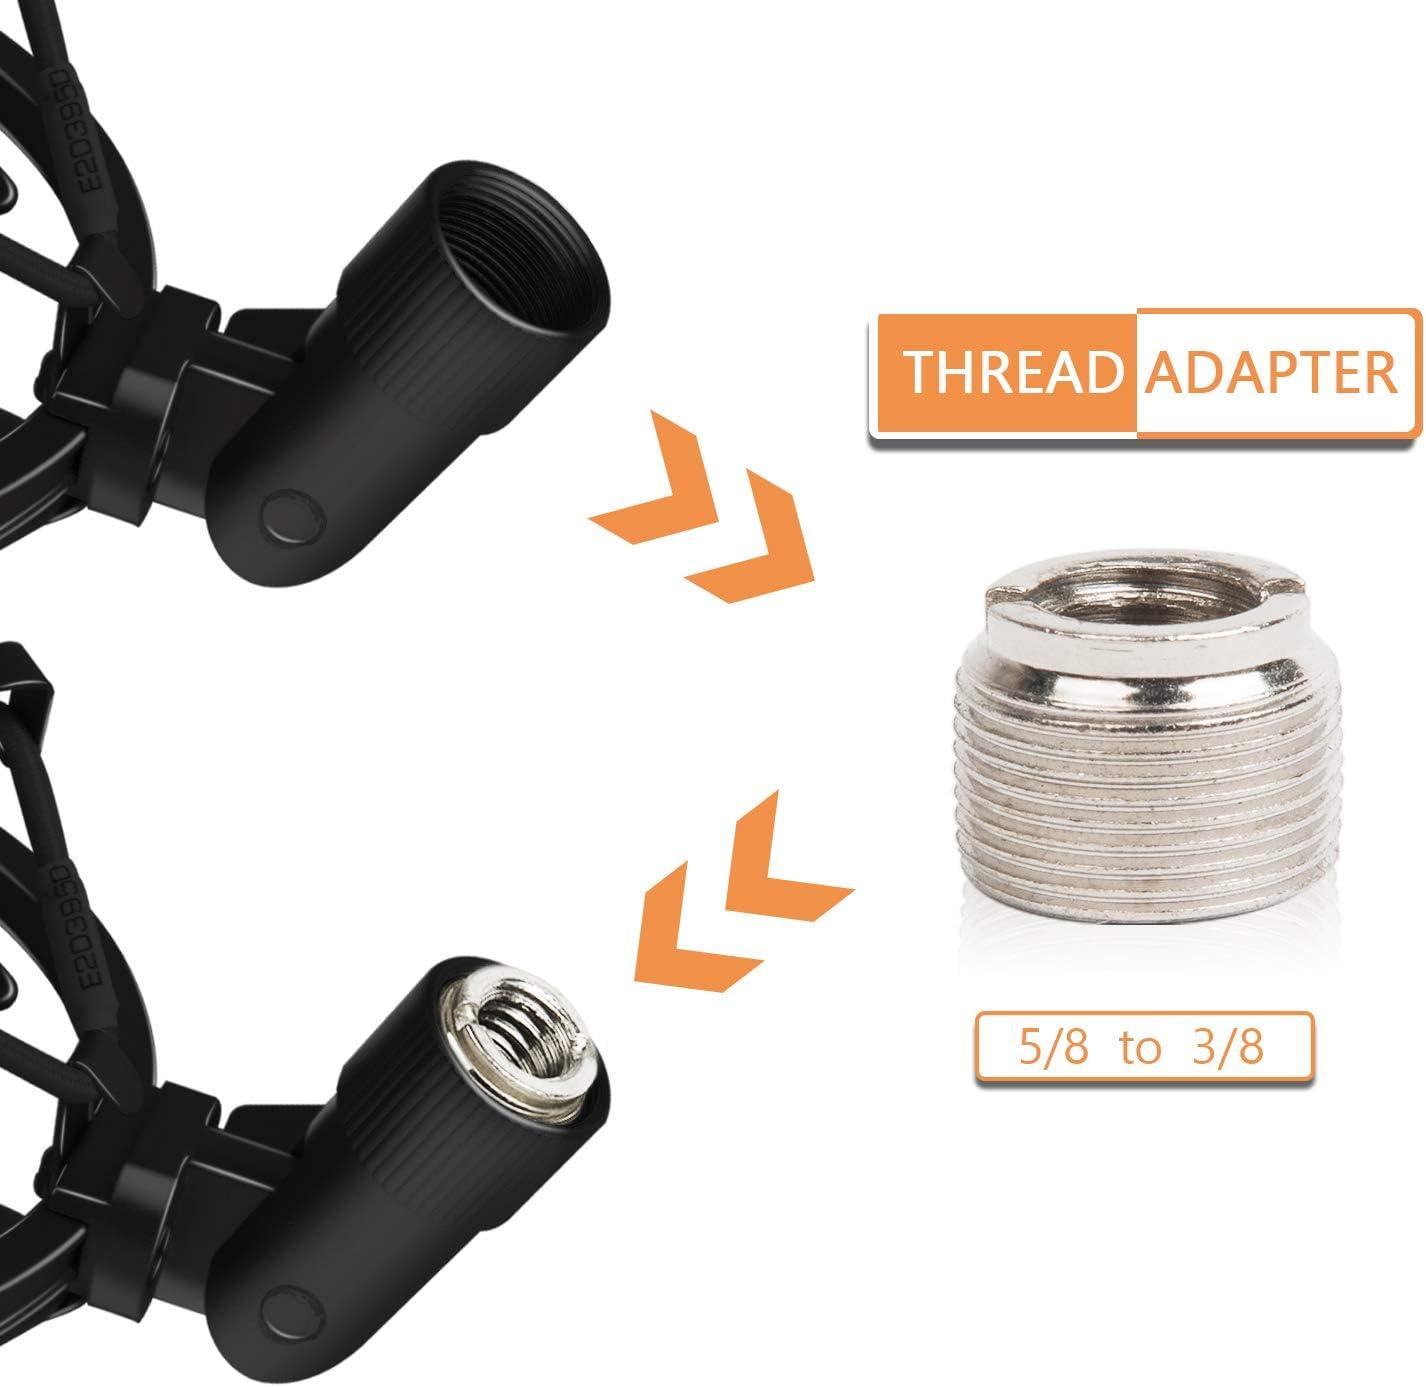 Mic Clip Holder Mount for Diameter 47mm-53mm Mic Anti Vibration Adjustable High Isolation Shock Mount Boseen Universal Microphone Shock Mount